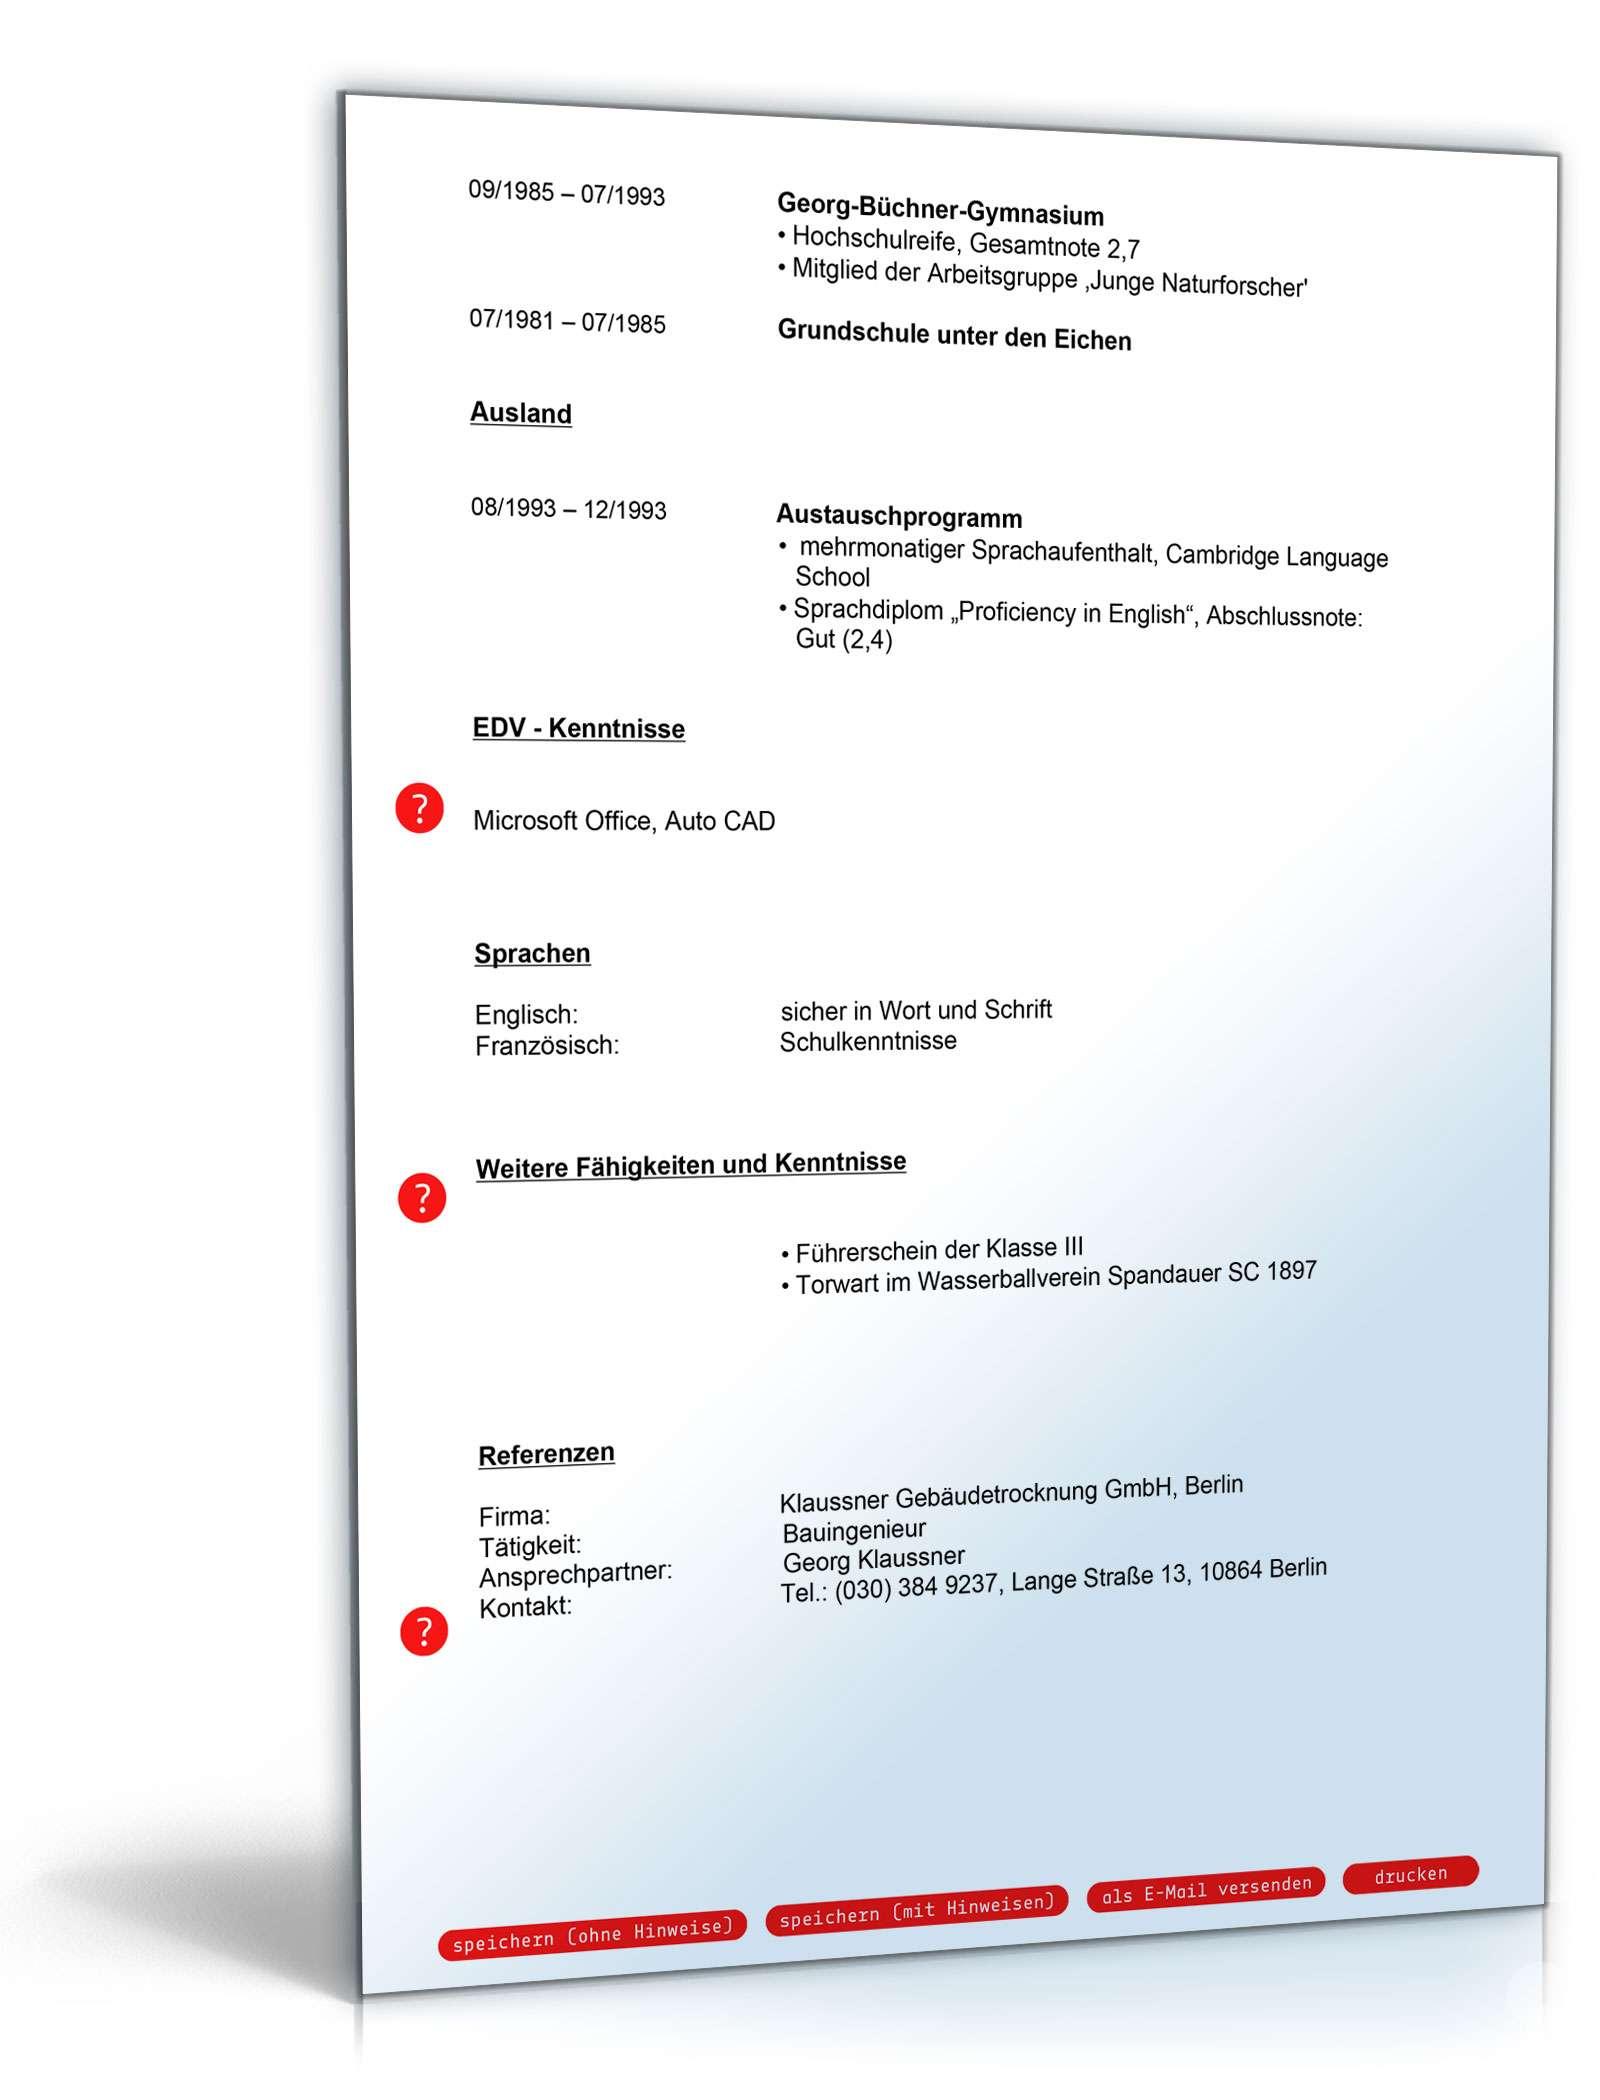 Lebenslauf bauingenieur muster zum download for Bewerbung architekturburo